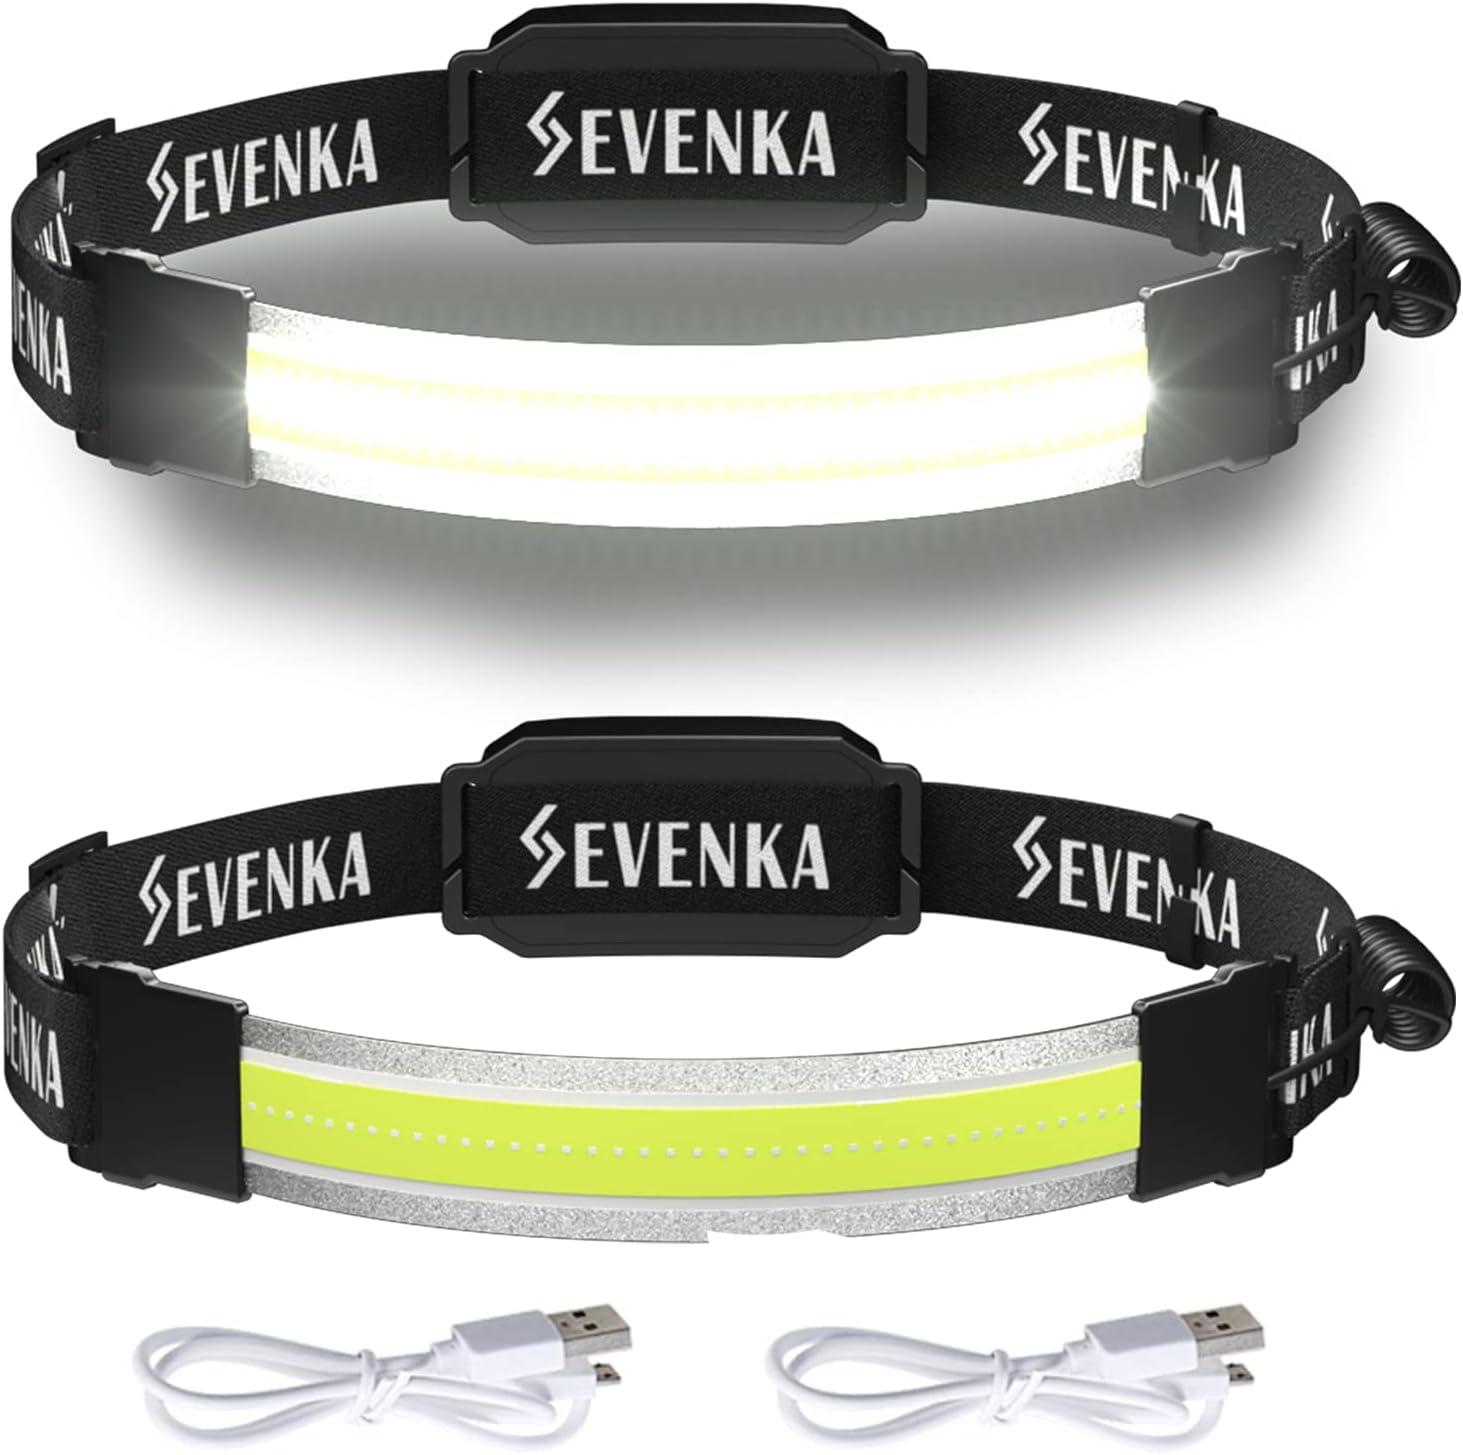 2 Rechargeable Headlamps, SEVENKA Bright LED Headlamp Flashlight